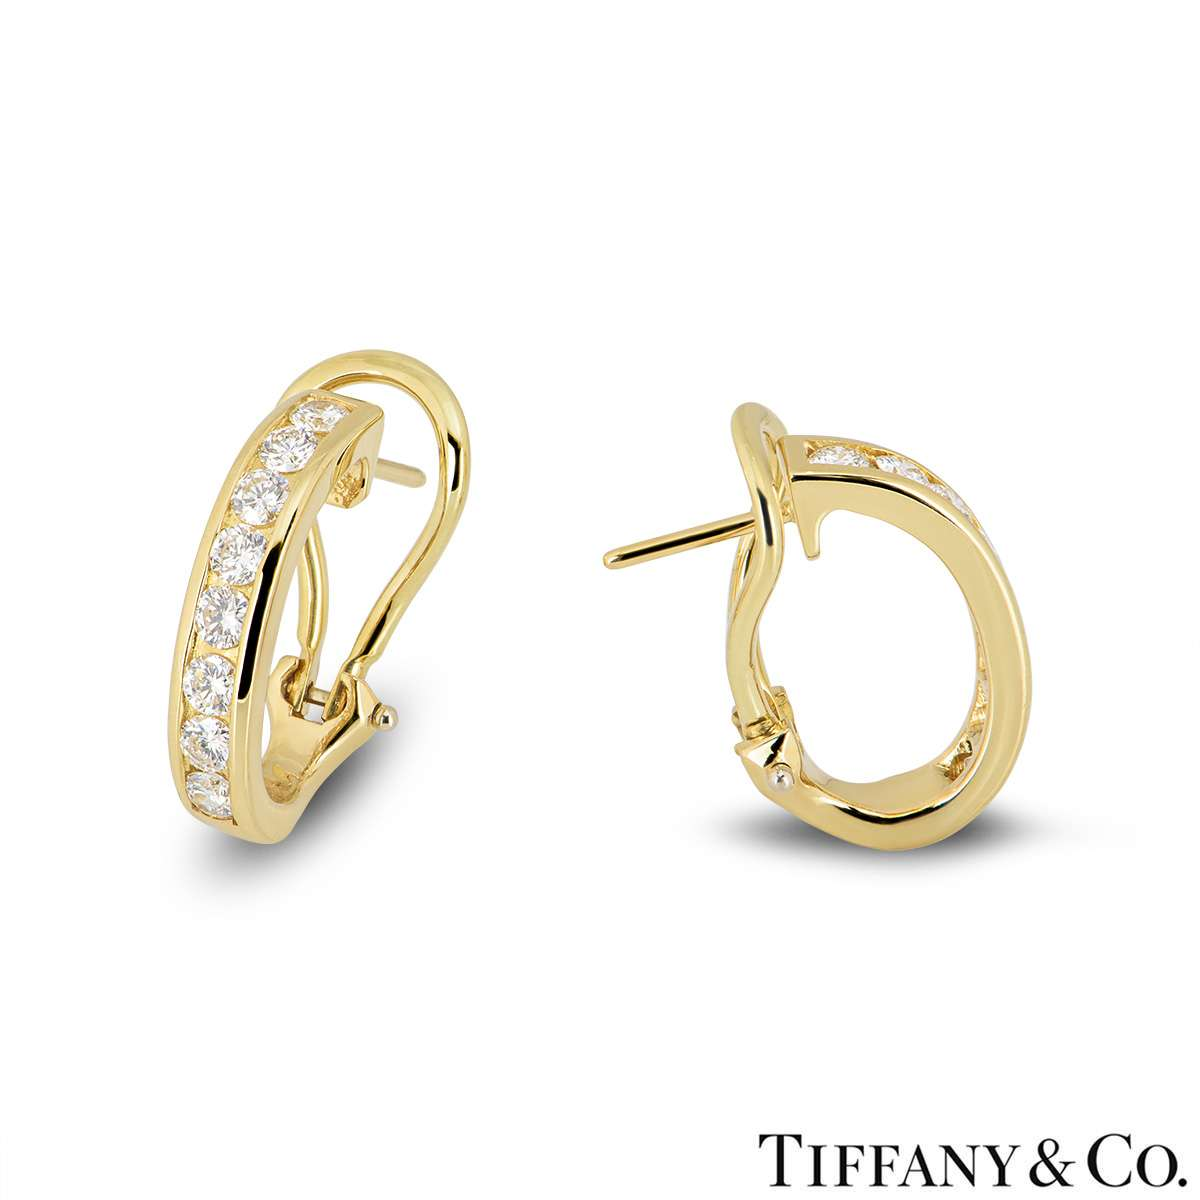 325be6528 ... Tiffany & Co 18k Yellow Gold Diamond Set Hoop Earrings 0.96ct ...